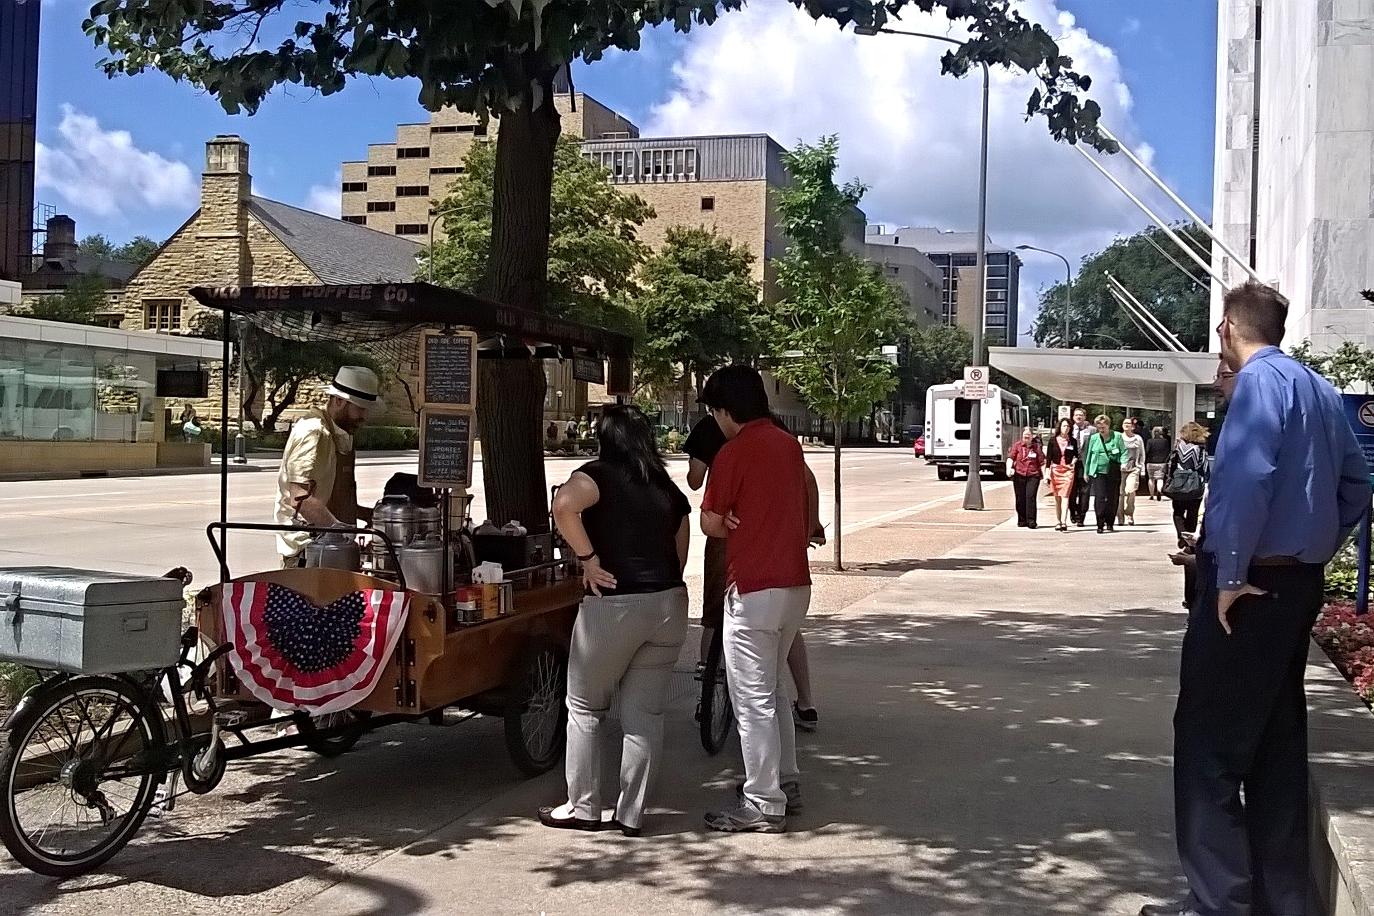 Abe's custom-made coffee trike / Med City Beat